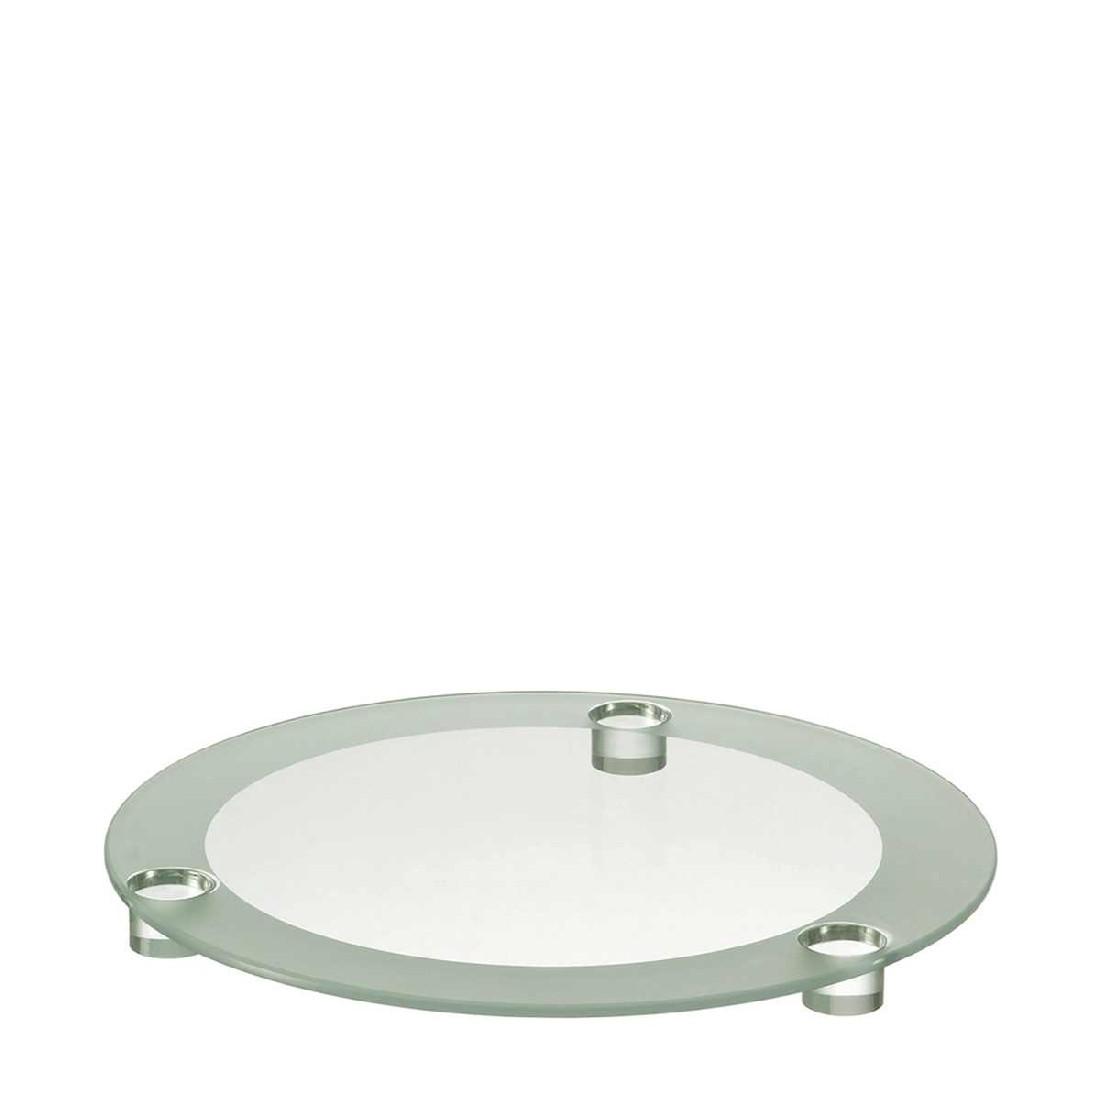 Tortenplatte Spirit - 33 cm, Leonardo